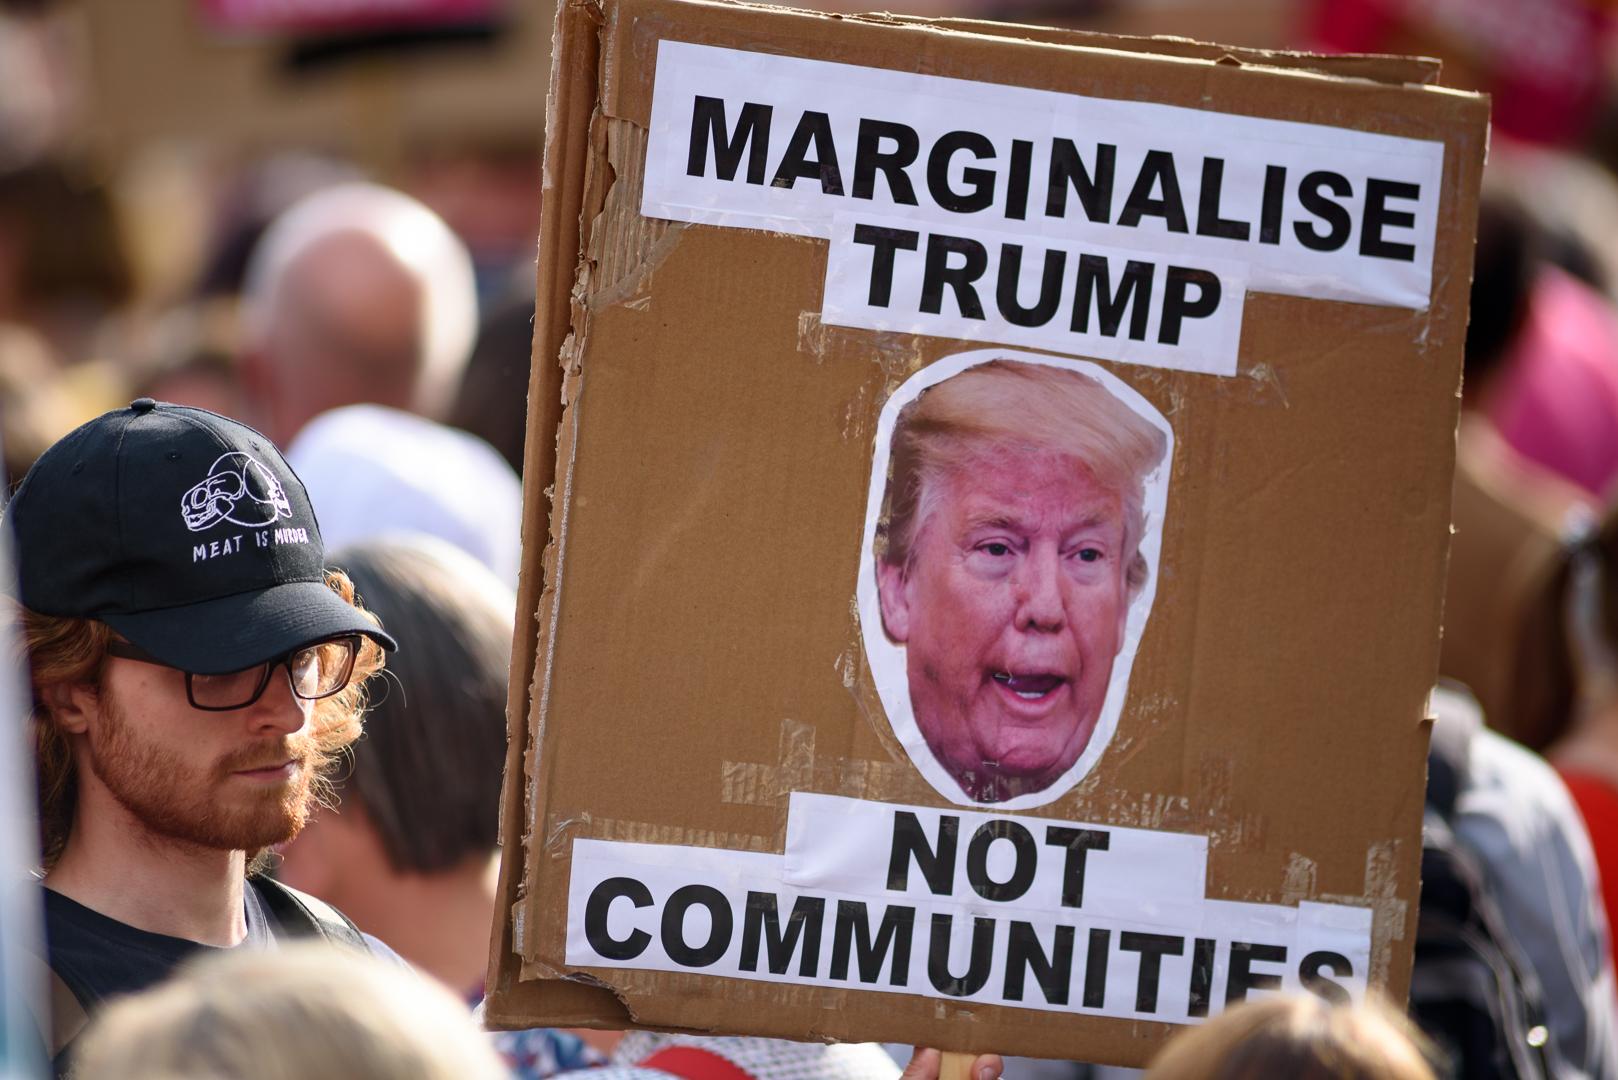 Sheffield Anti-Trump rally July 2018 Blog11.jpg